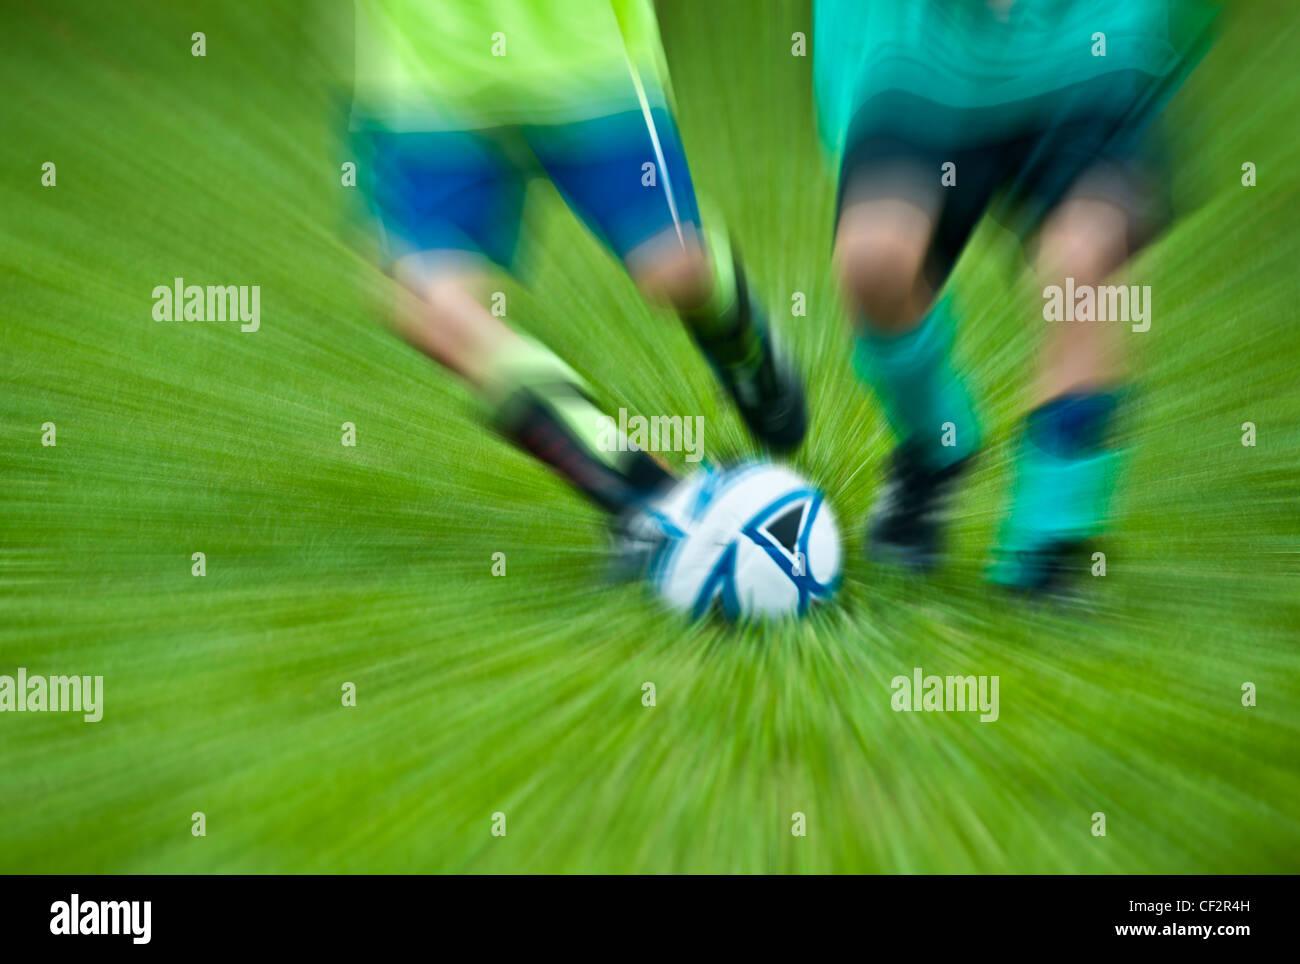 Jungen-Jugend-Fußball-Spiel. Stockbild